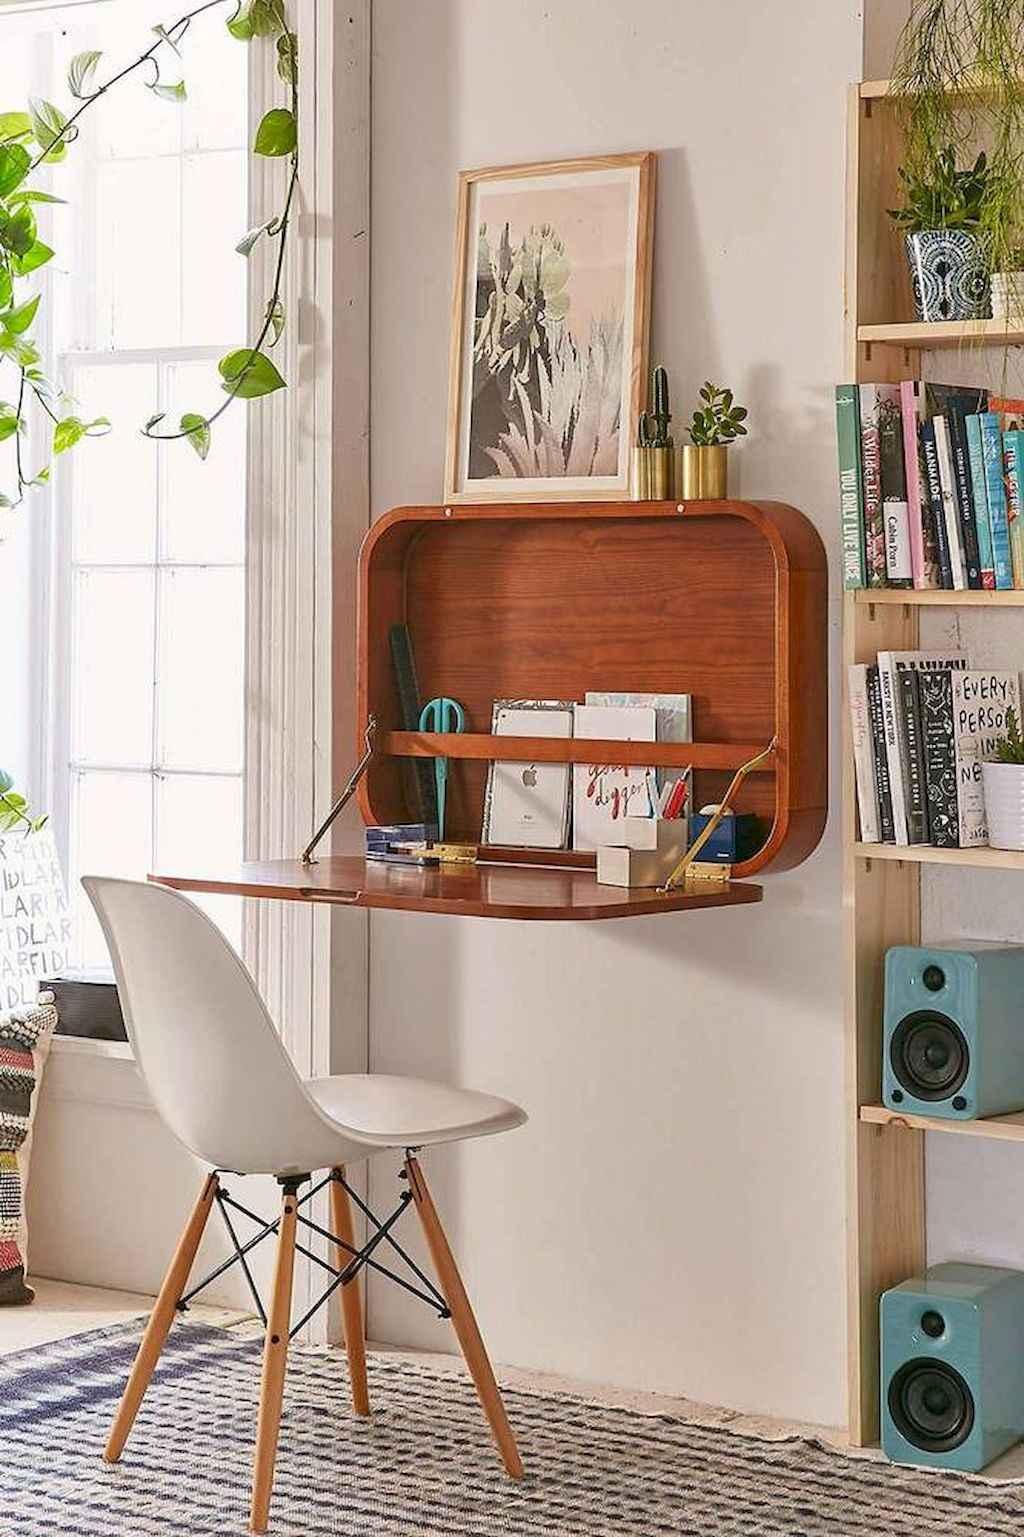 Small apartment decorating ideas (44)